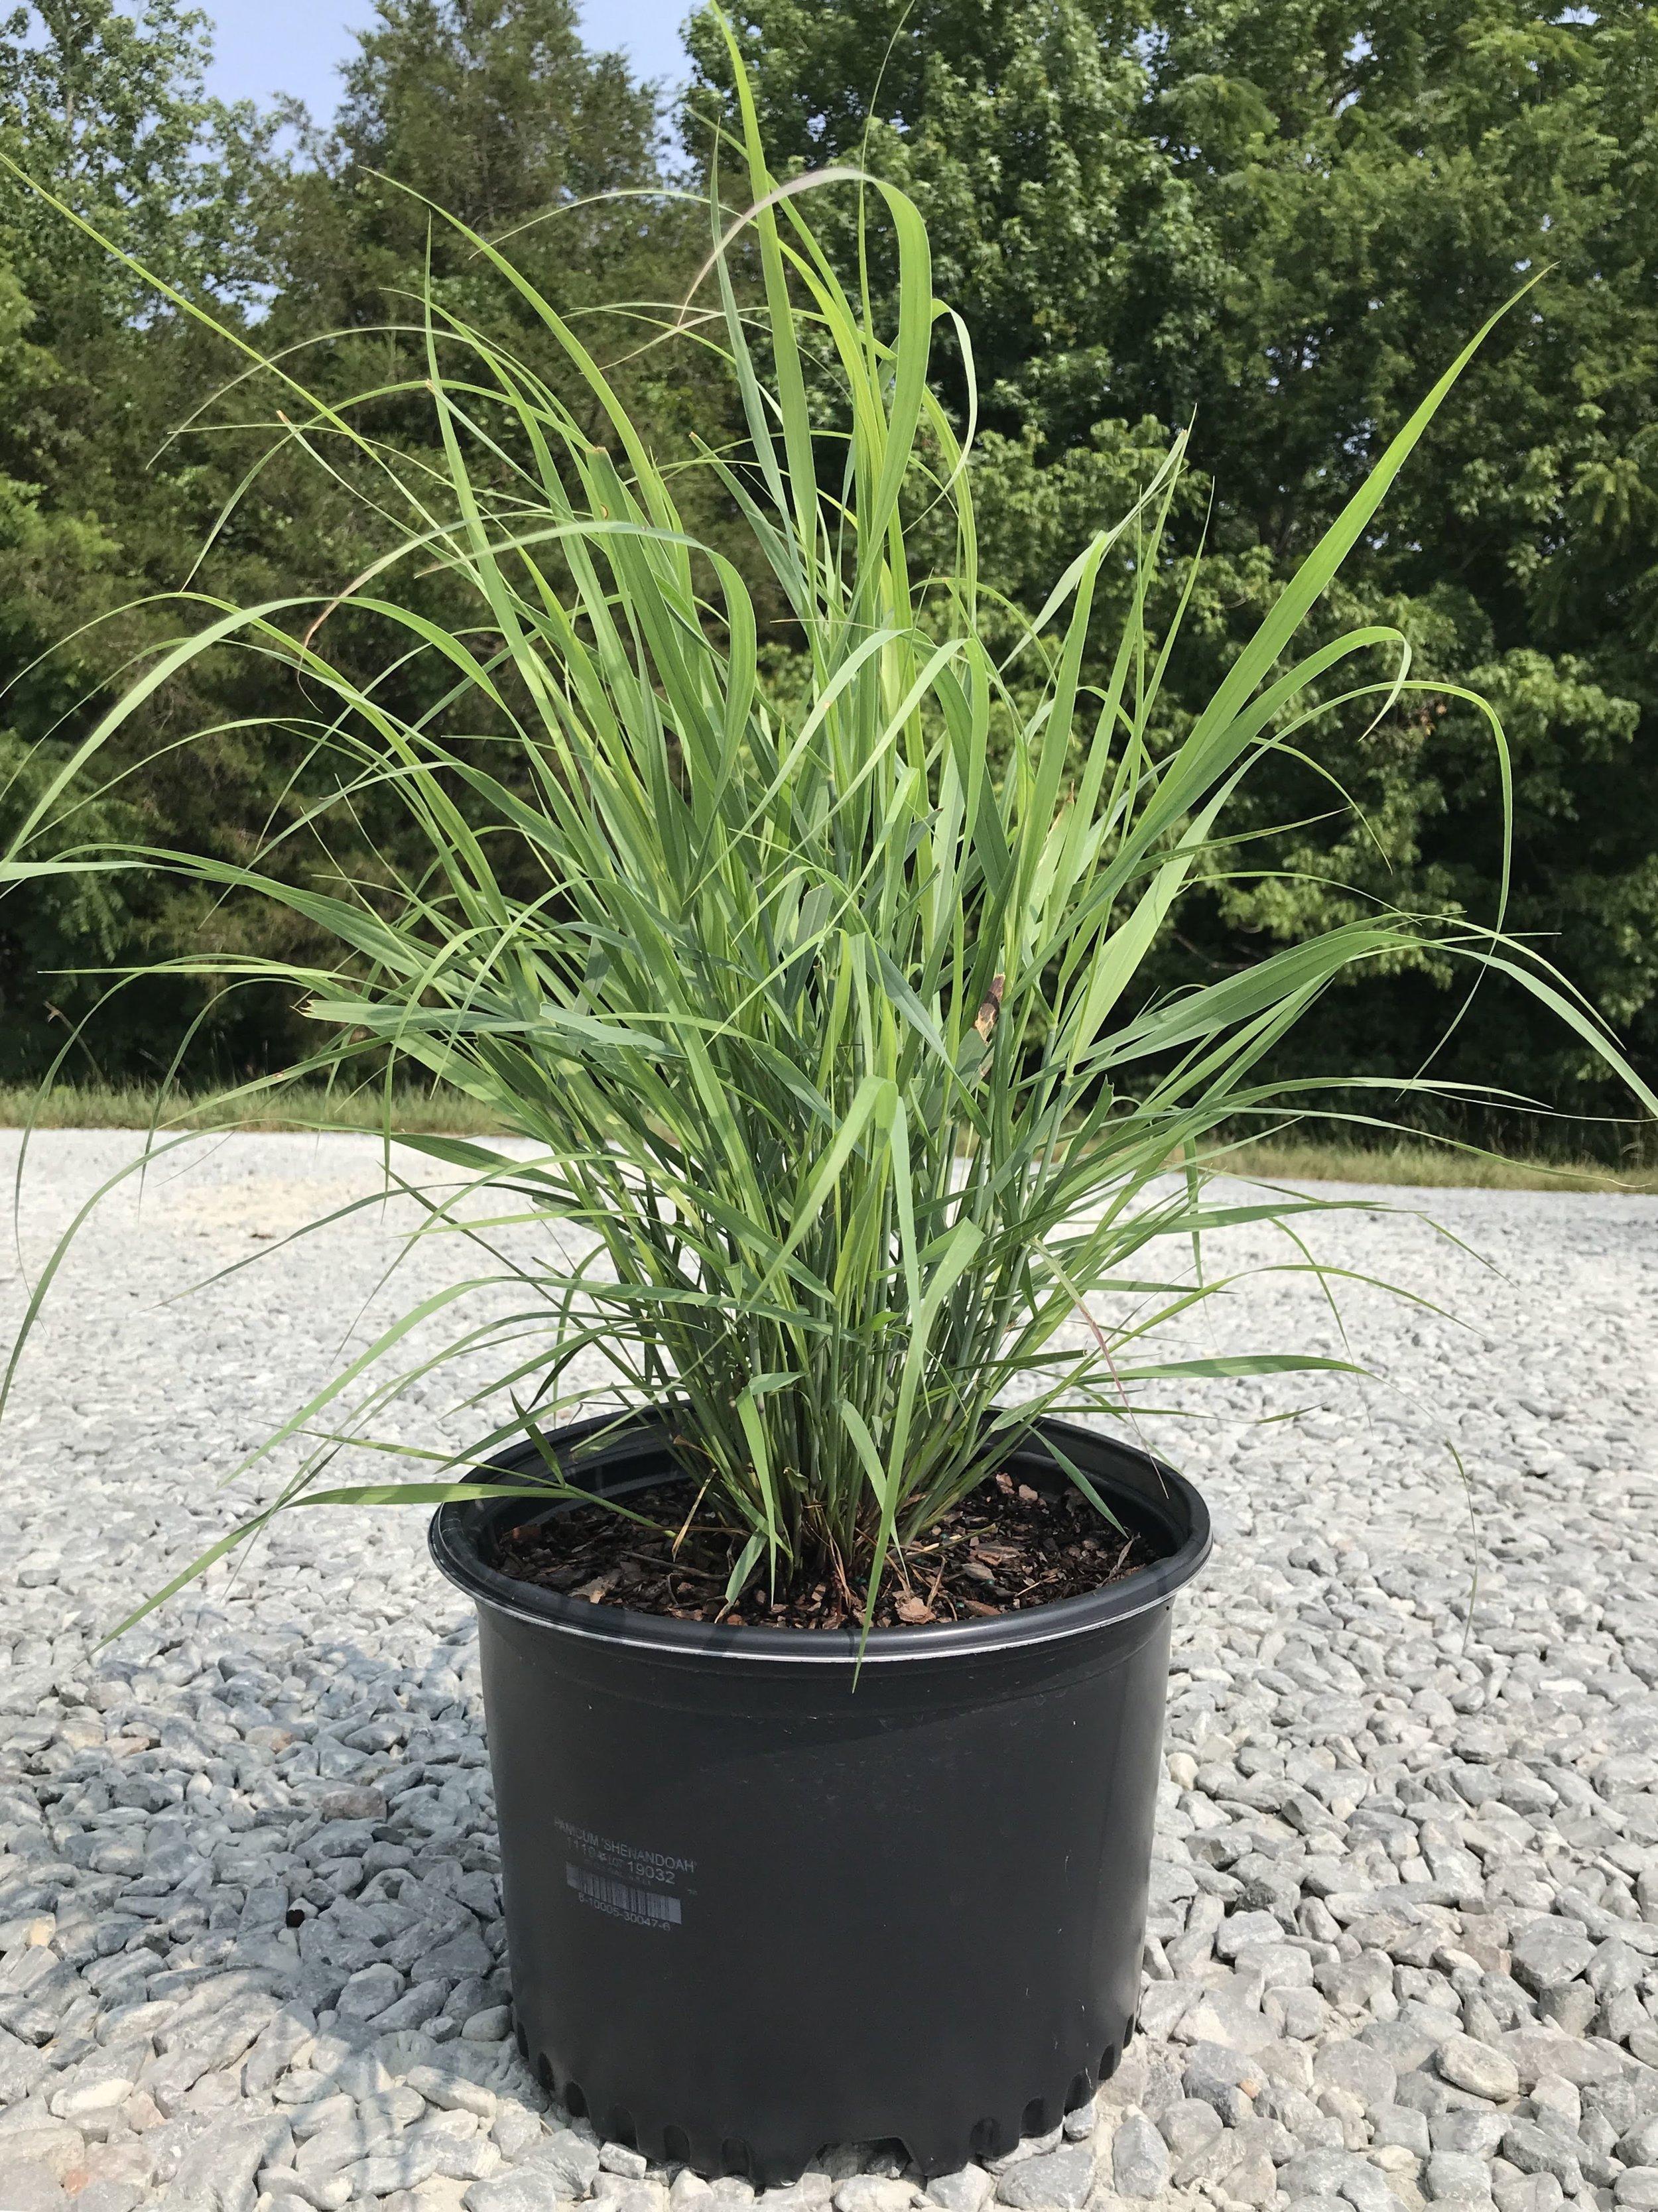 Panicum virgatum 'Shenandoah' 3 gallon